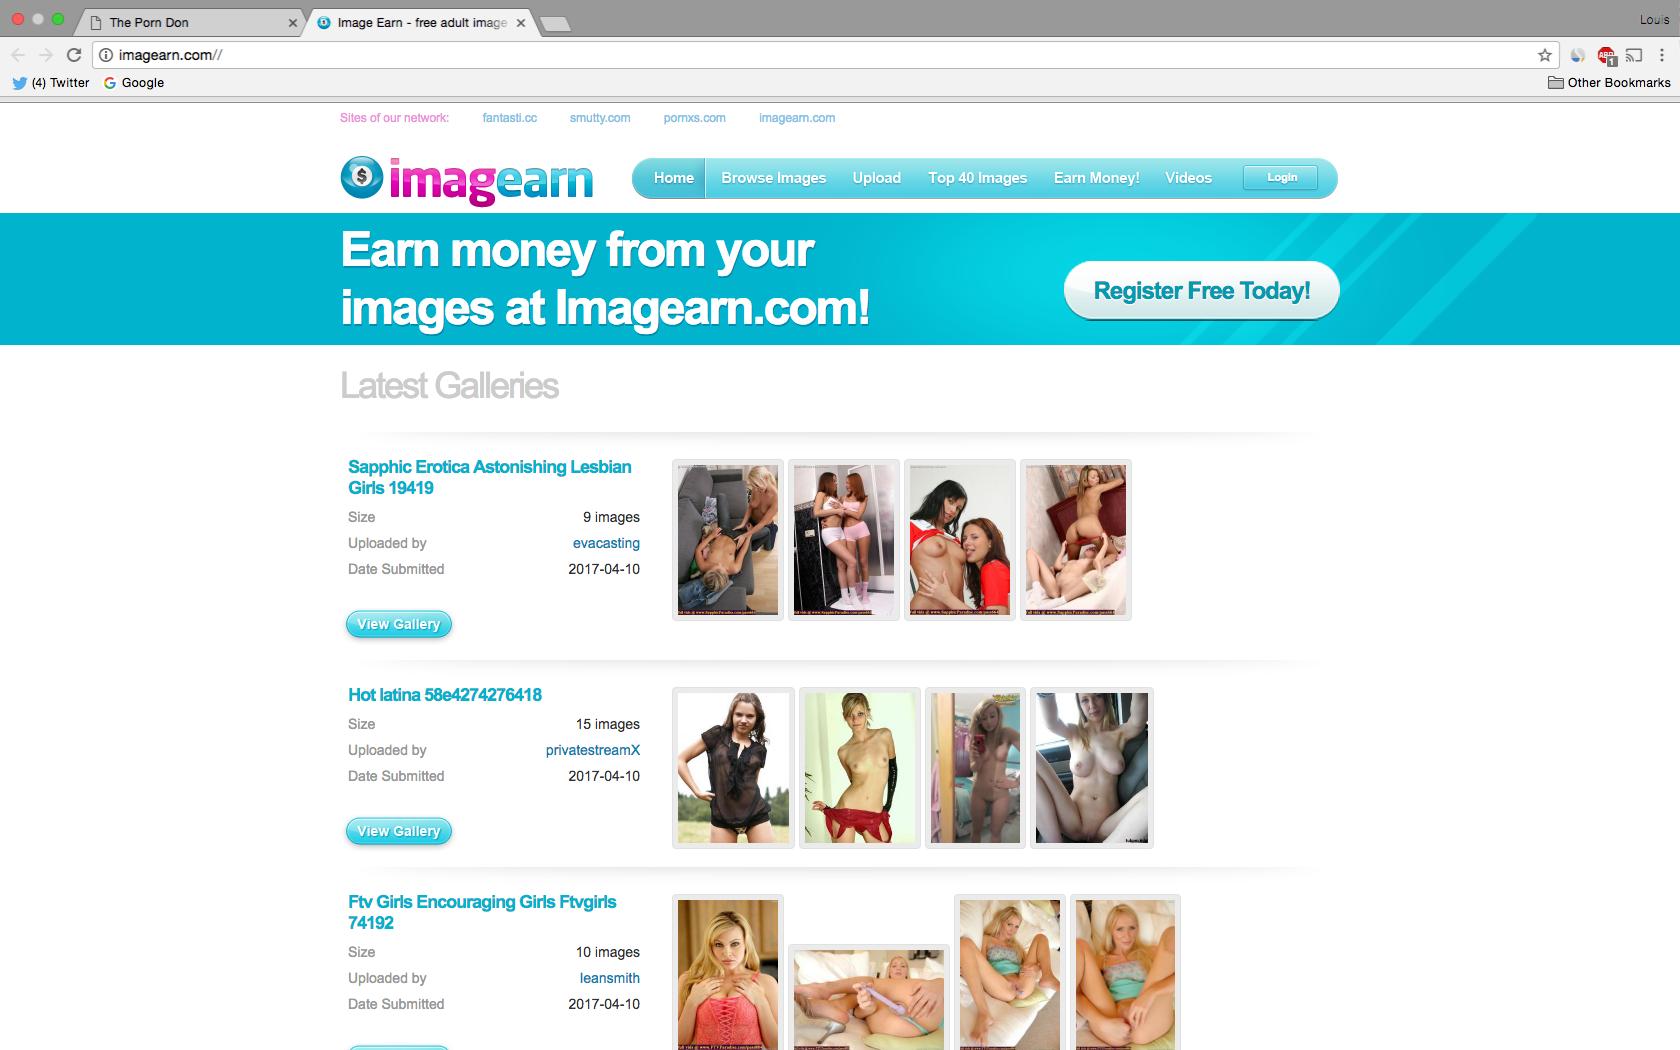 ImagEarn